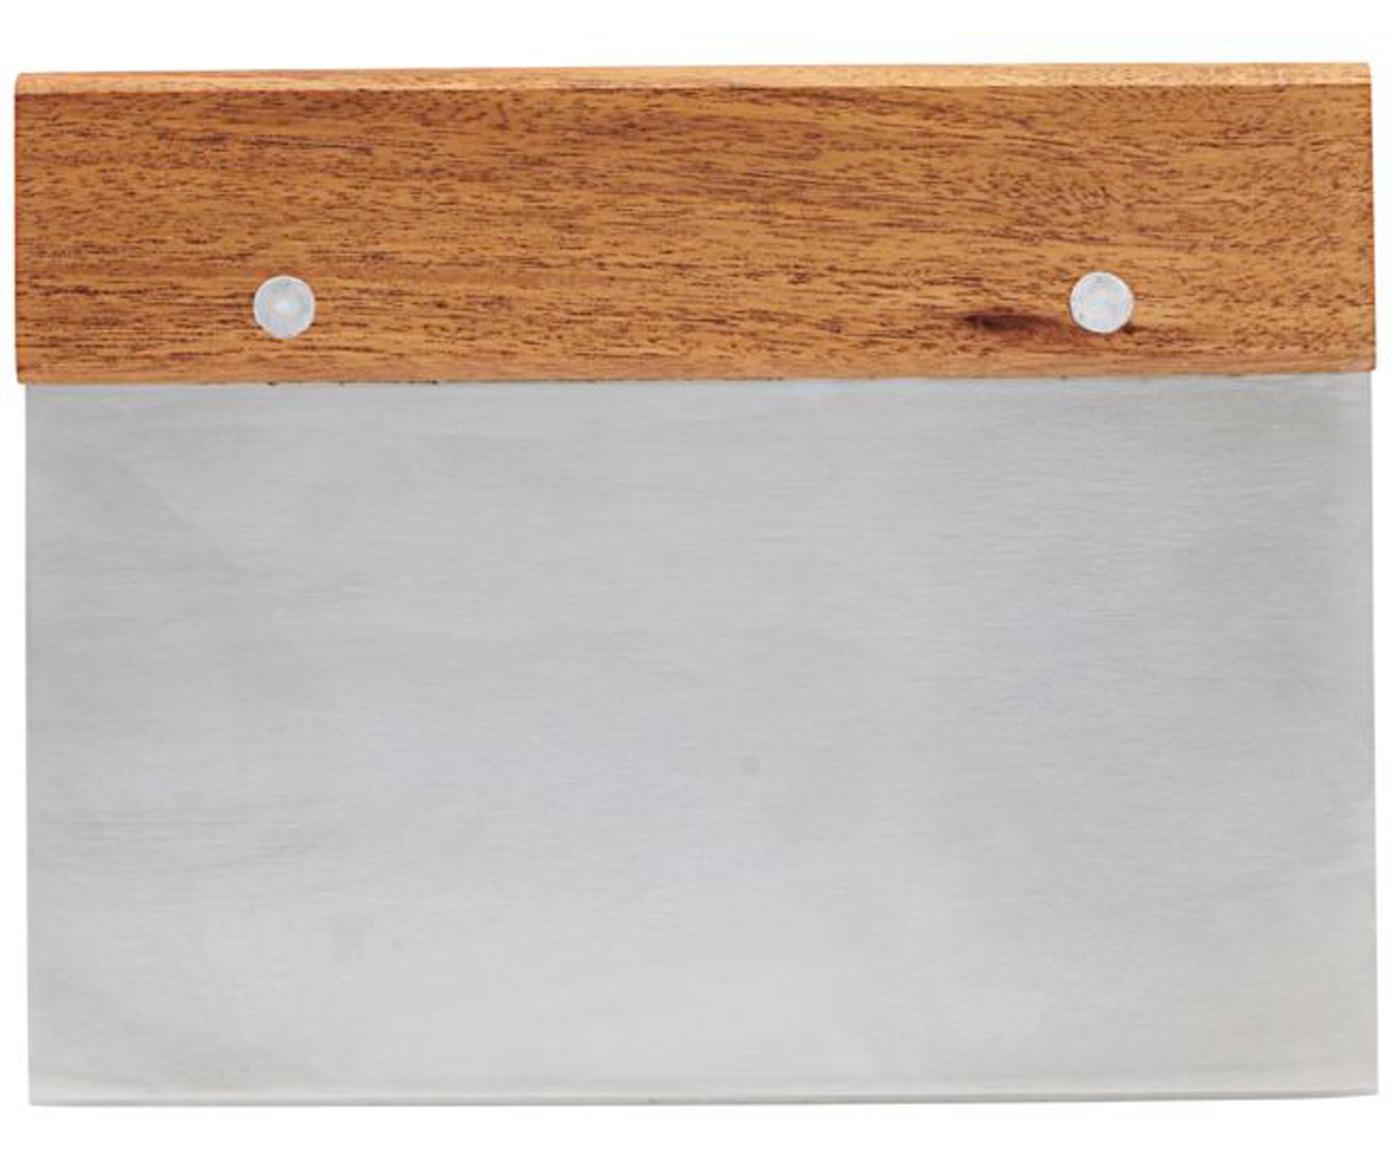 Deegsnijder Puka, Acaciahoutkleurig, edelstaalkleurig, Acaciahoutkleurig, edelstaalkleurig, 15 x 12 cm